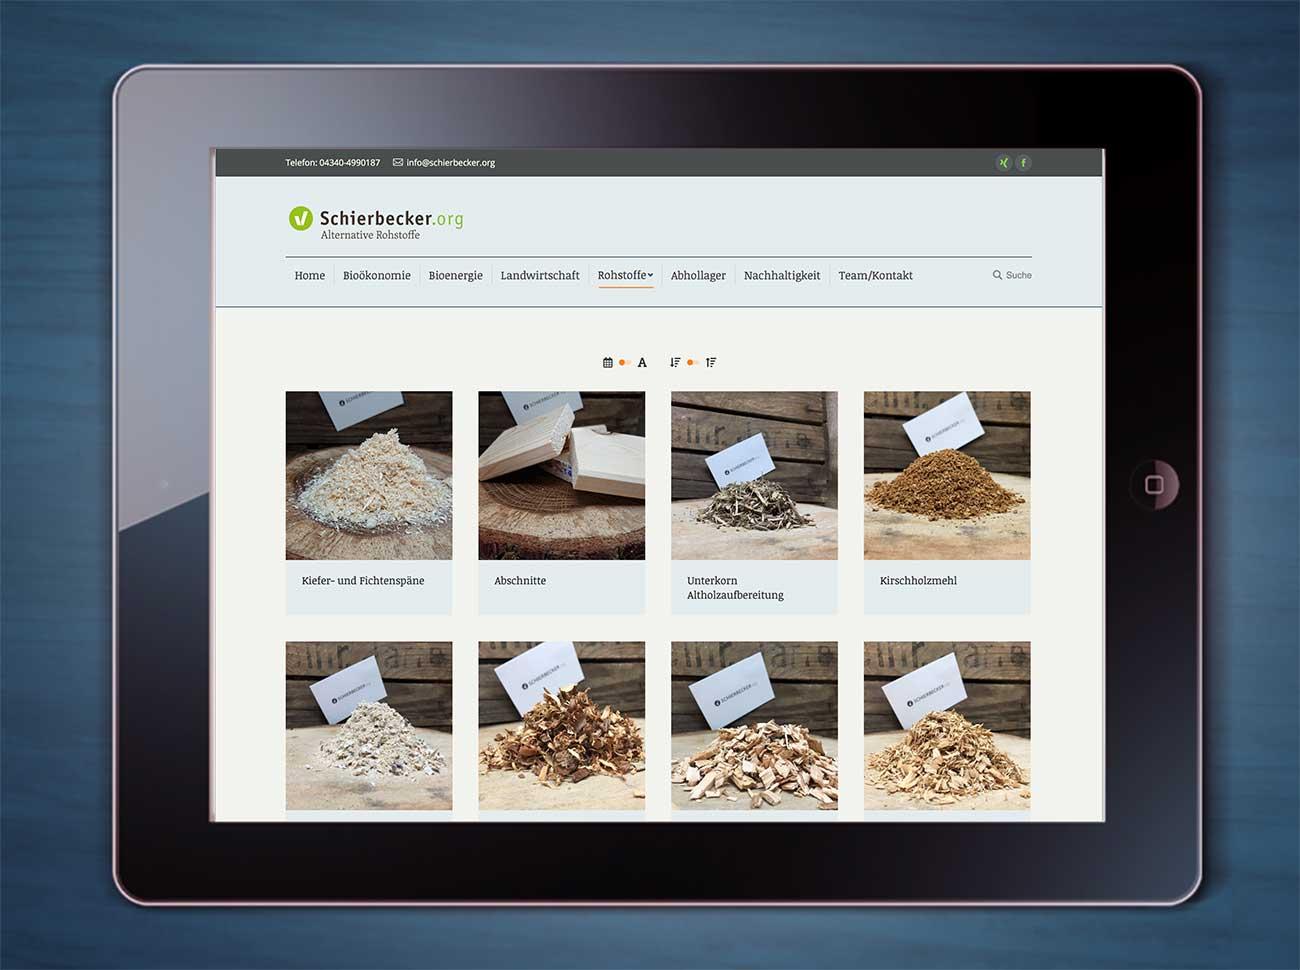 Schierbecker-Website-iPad-quer-Produkte